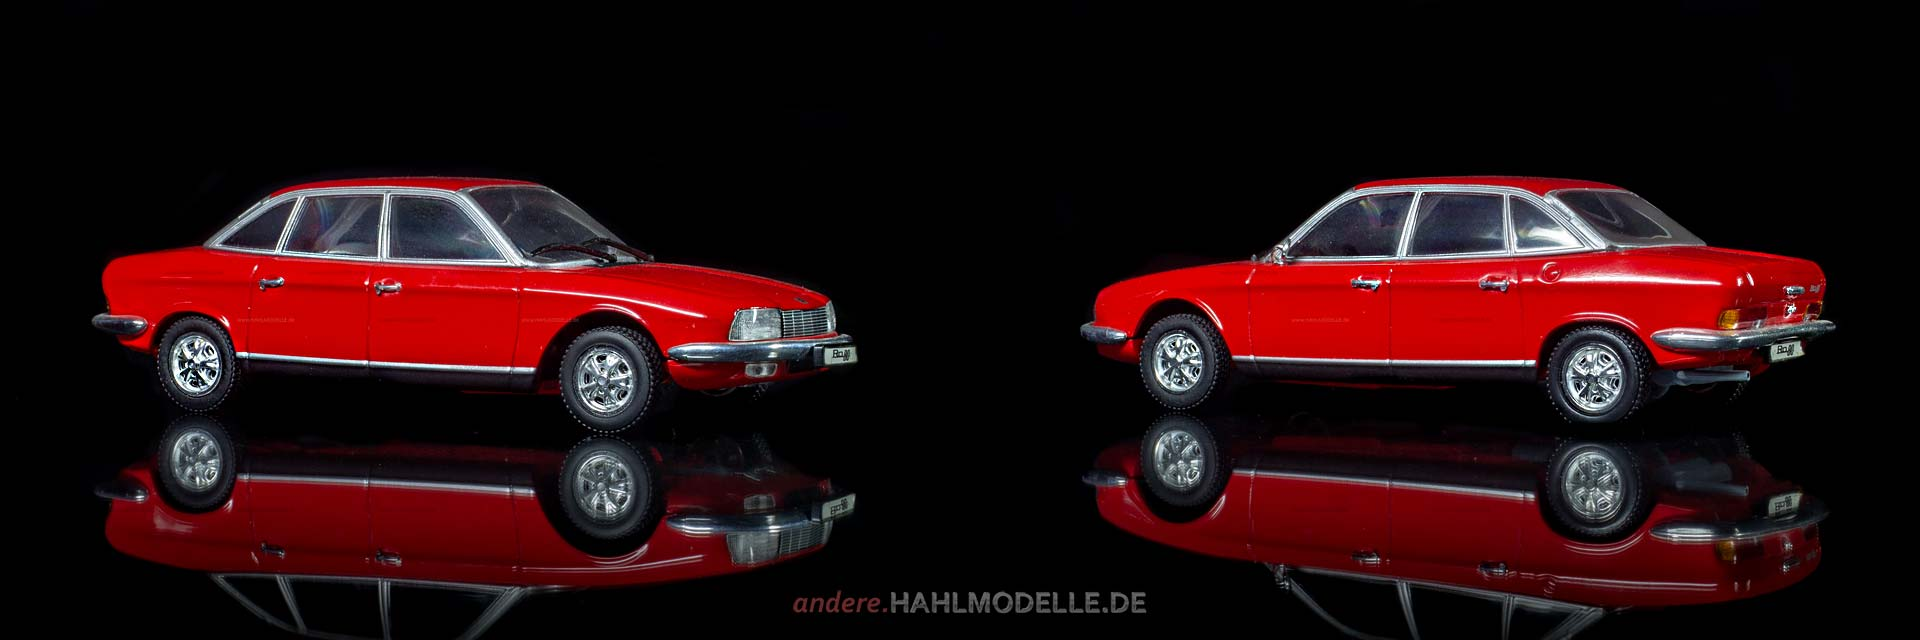 NSU Ro 80 | Limousine | Minichamps | www.andere.hahlmodelle.de